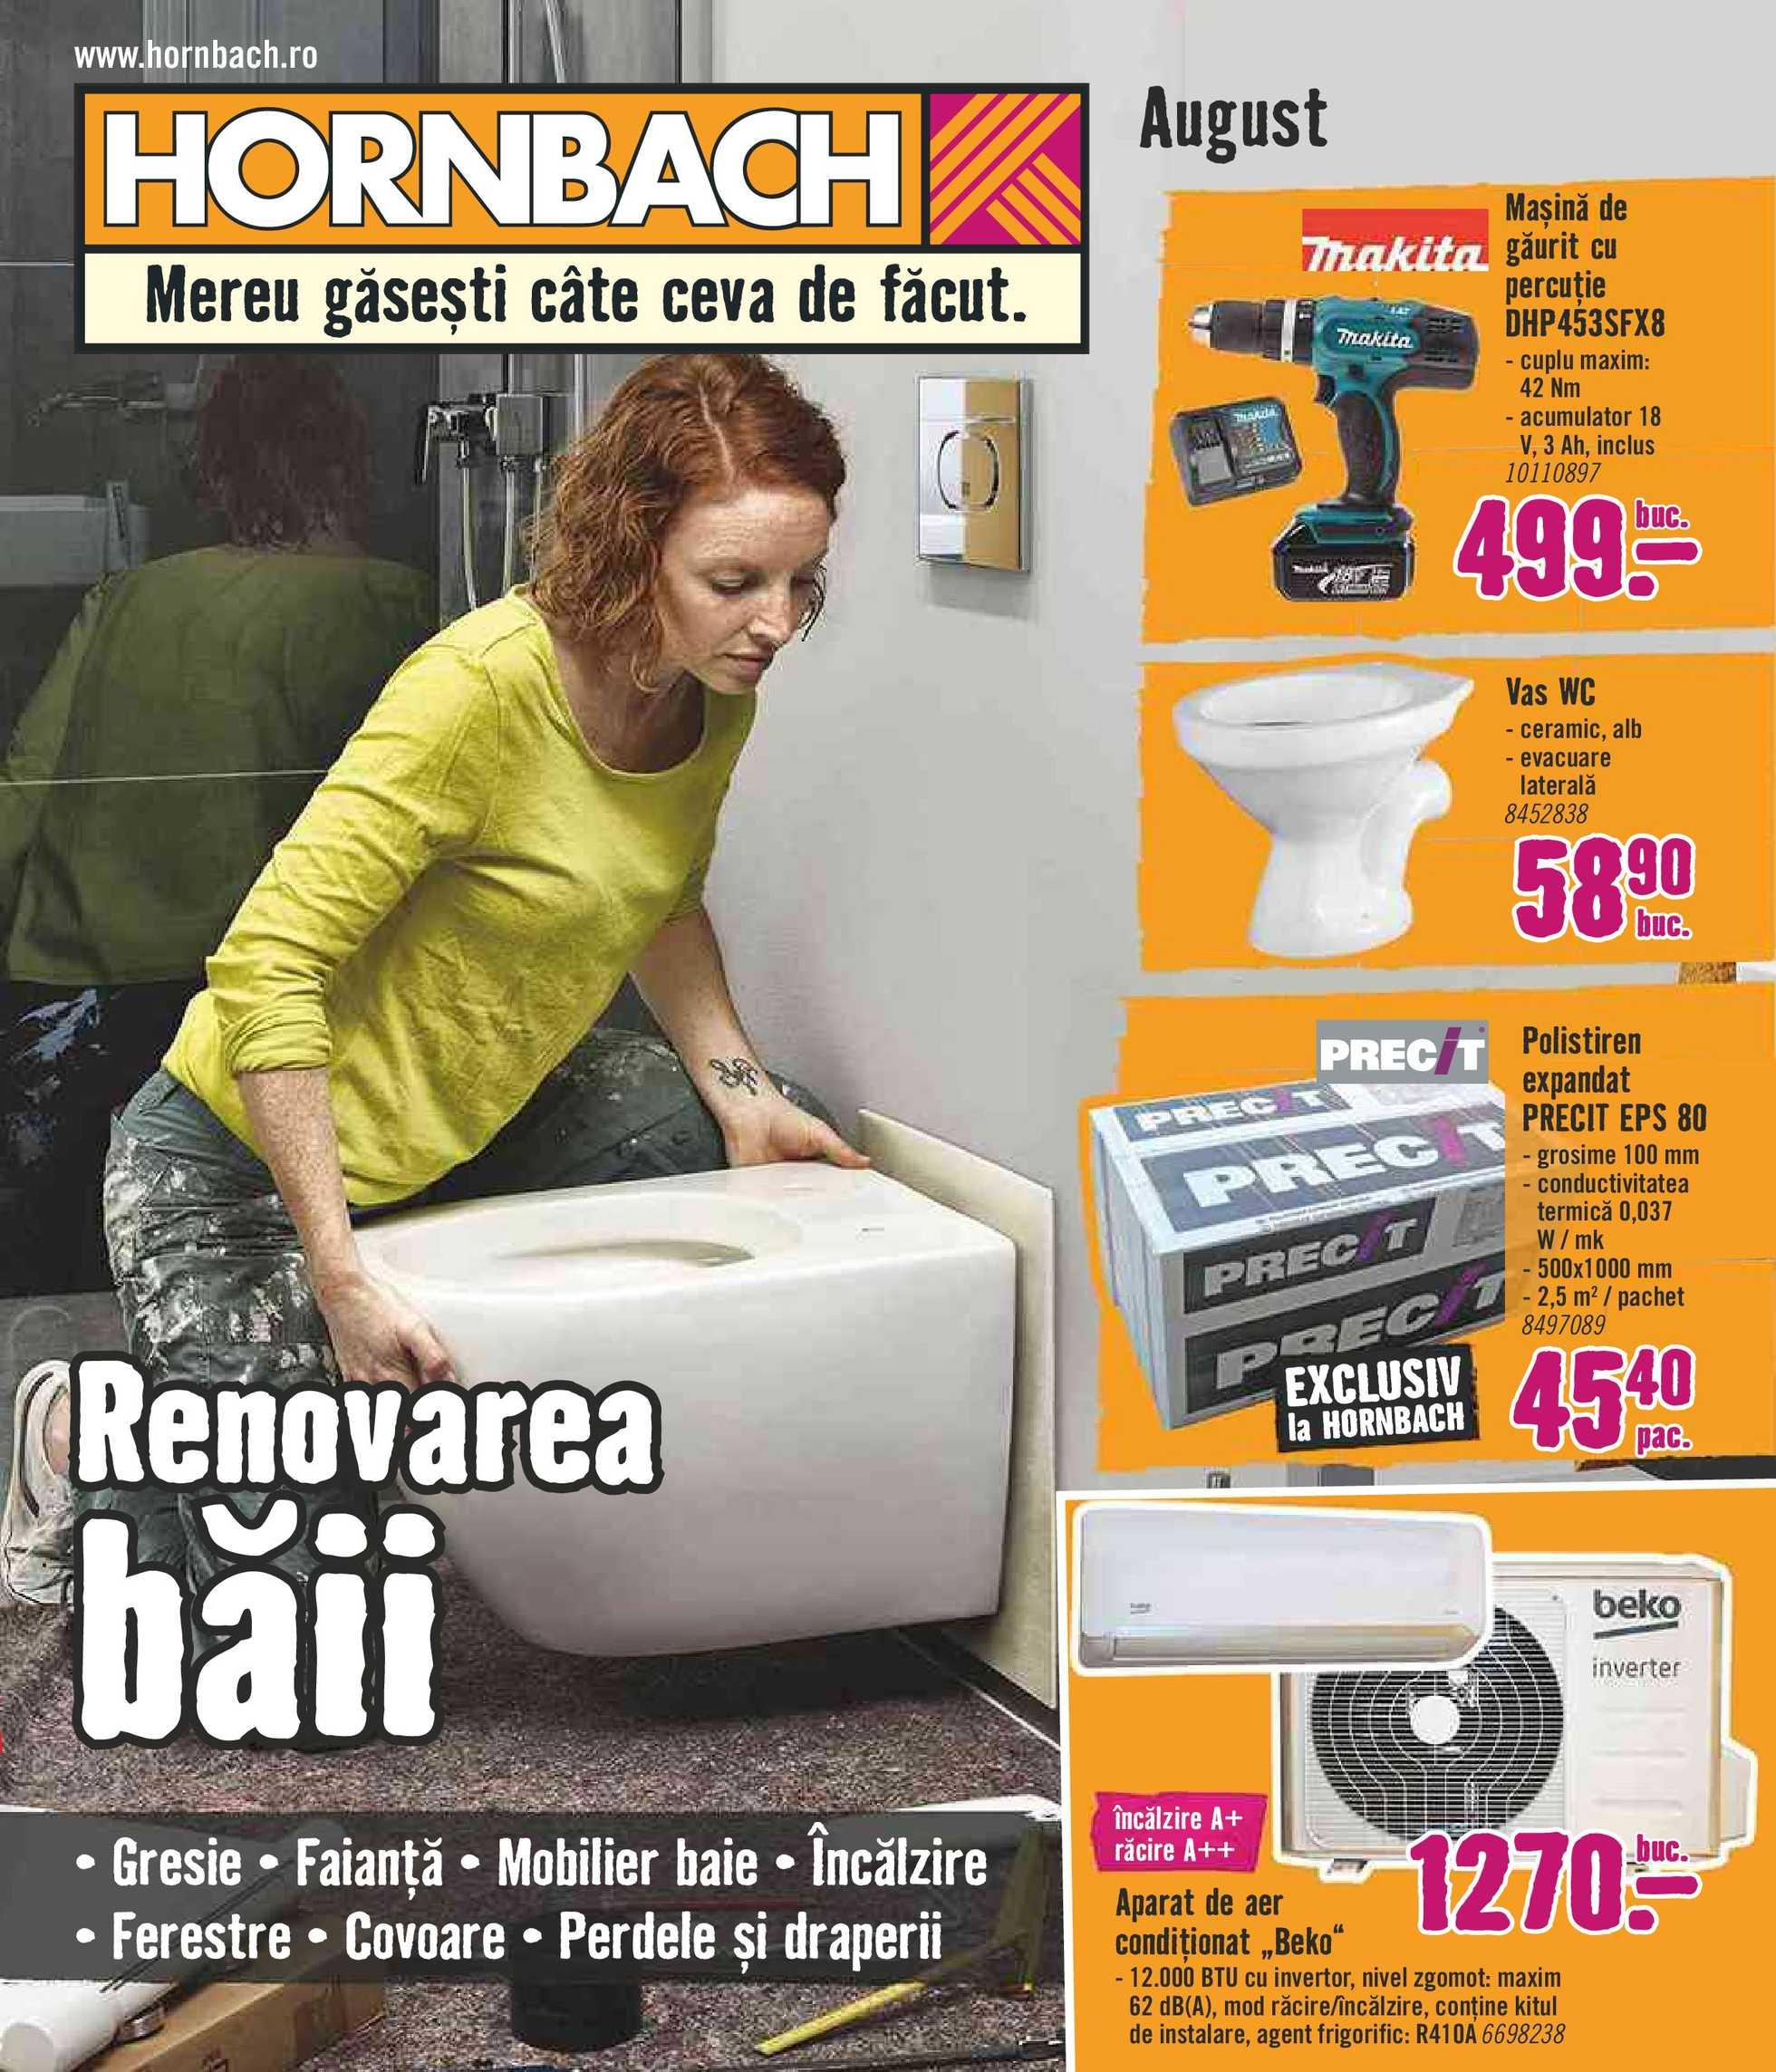 Hornbach - NEWSPAPERS_singleNewspaper_alt_presentationSliderItem_startAt 2019-07-30 - pagină 1